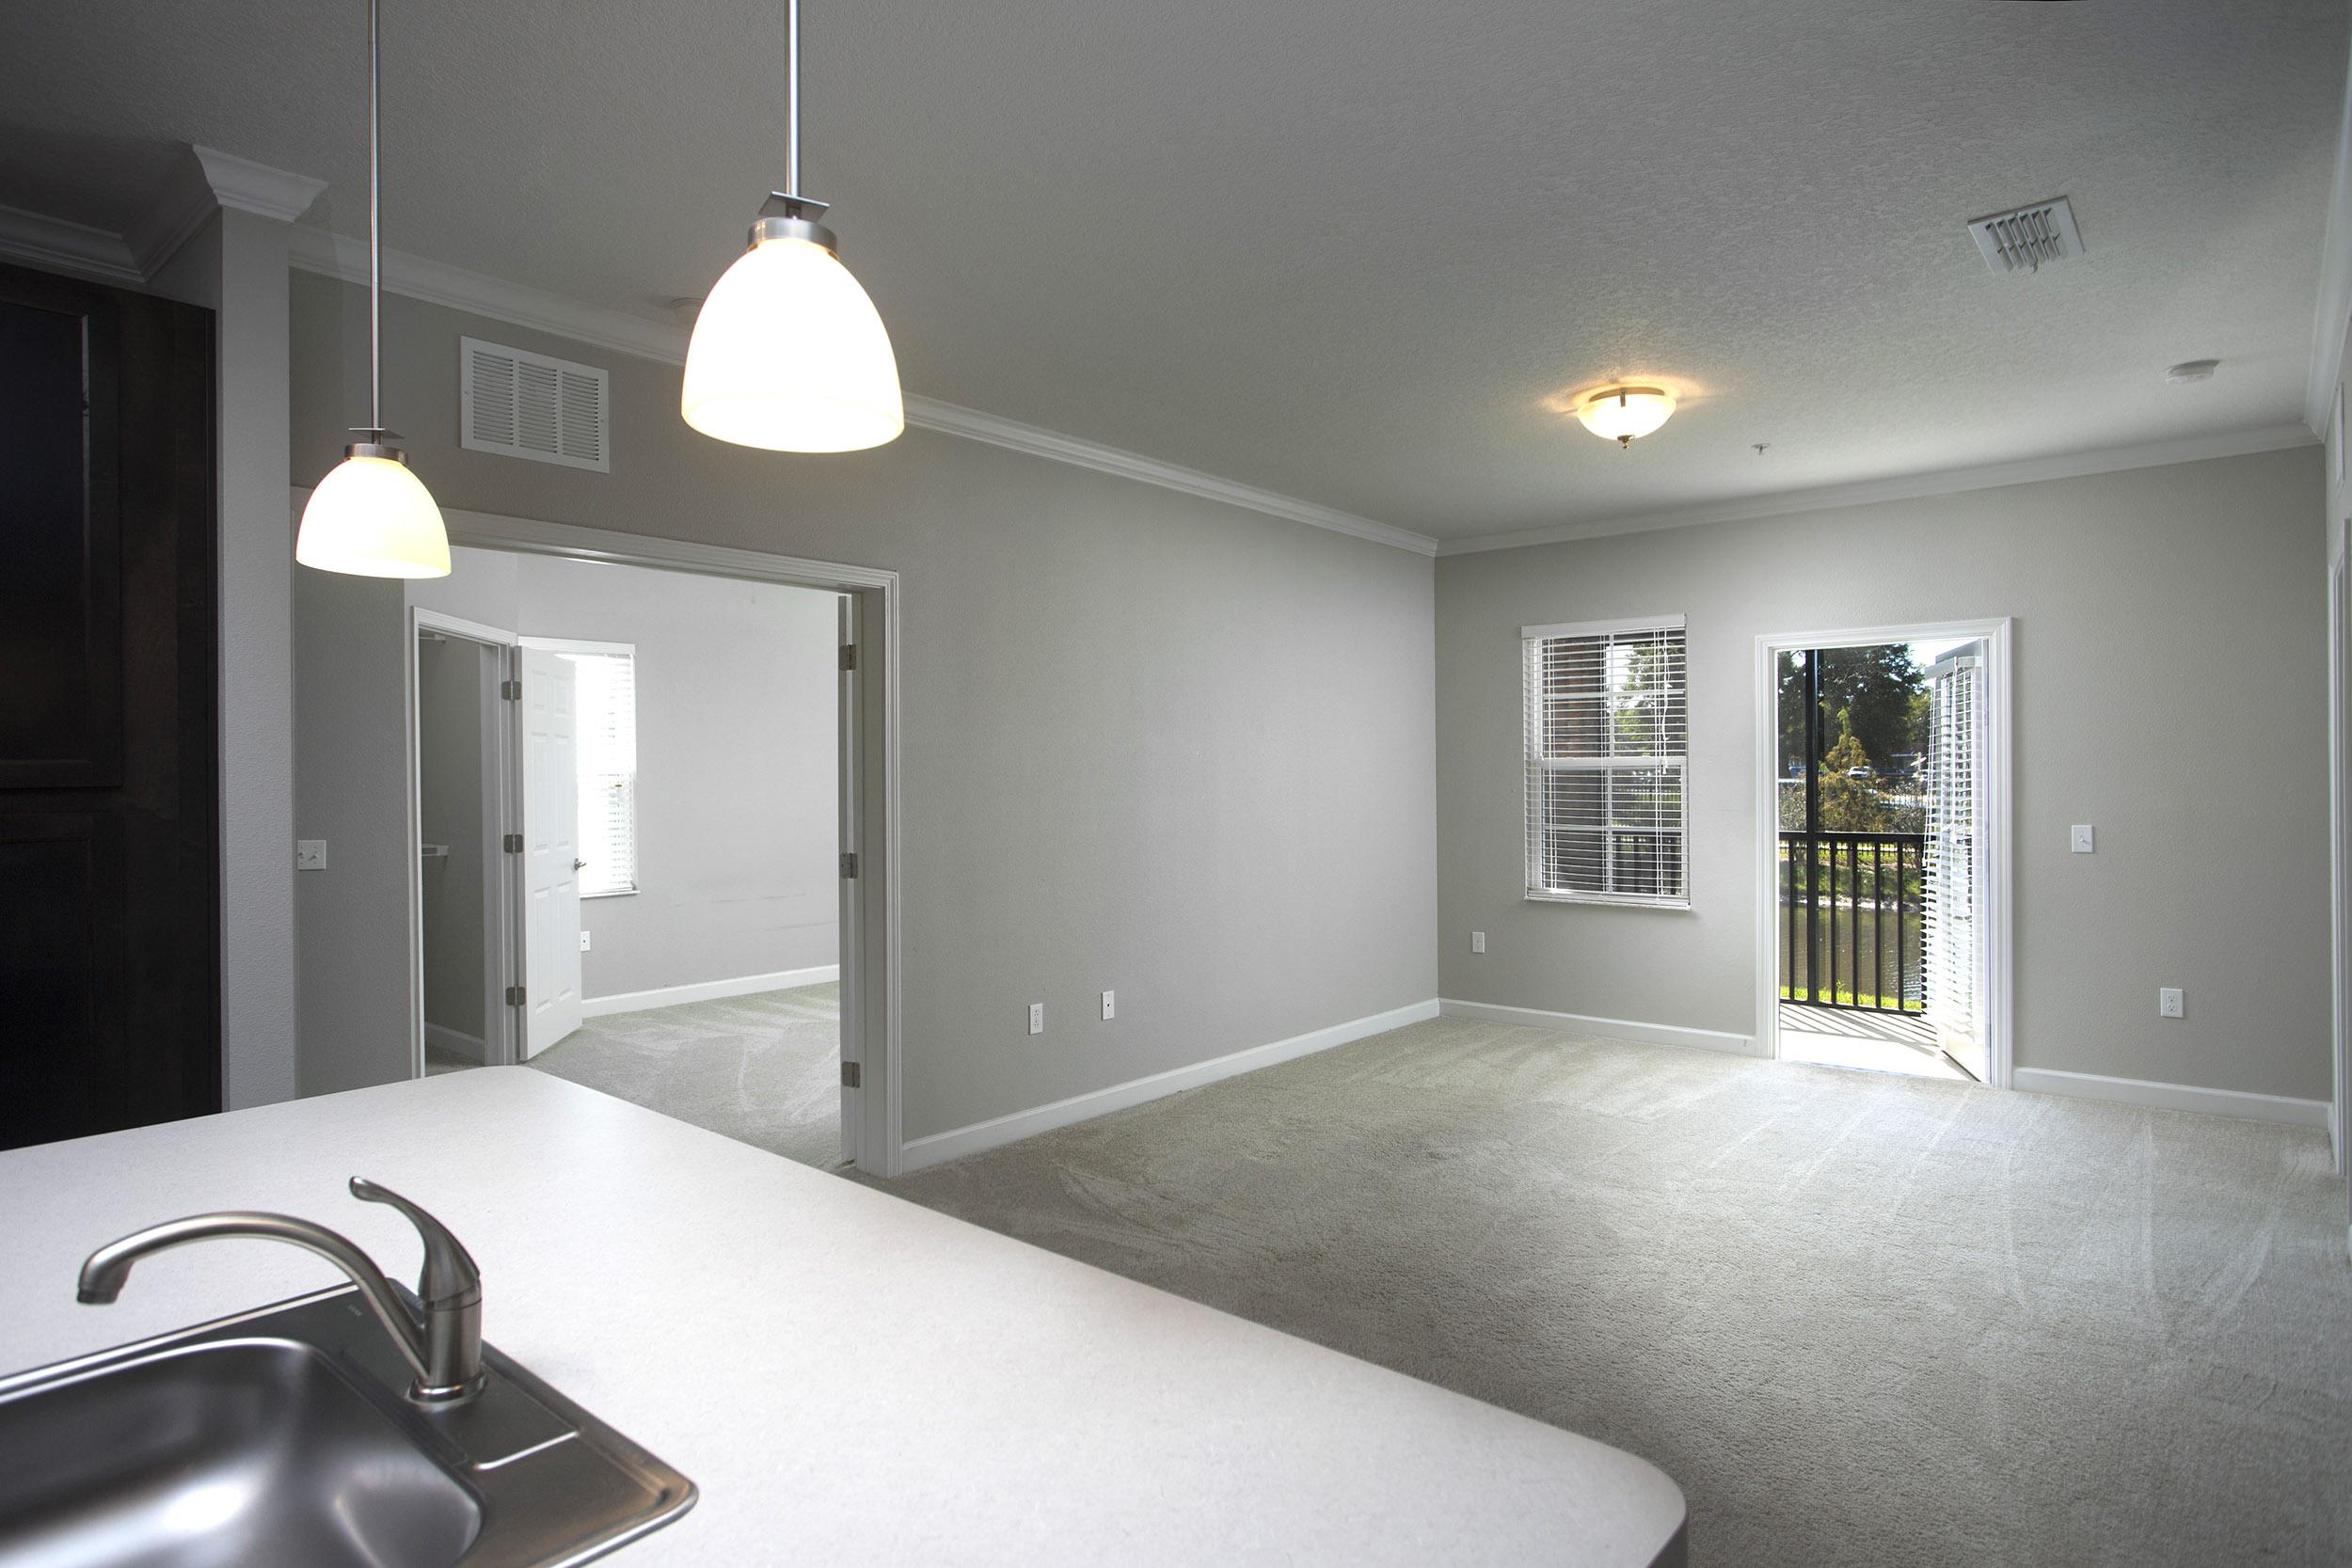 CharlestonEdge-Rental-Apartment-Brandon-Tampa-Florida-Pool-Bedrooms-Interior-2.jpg